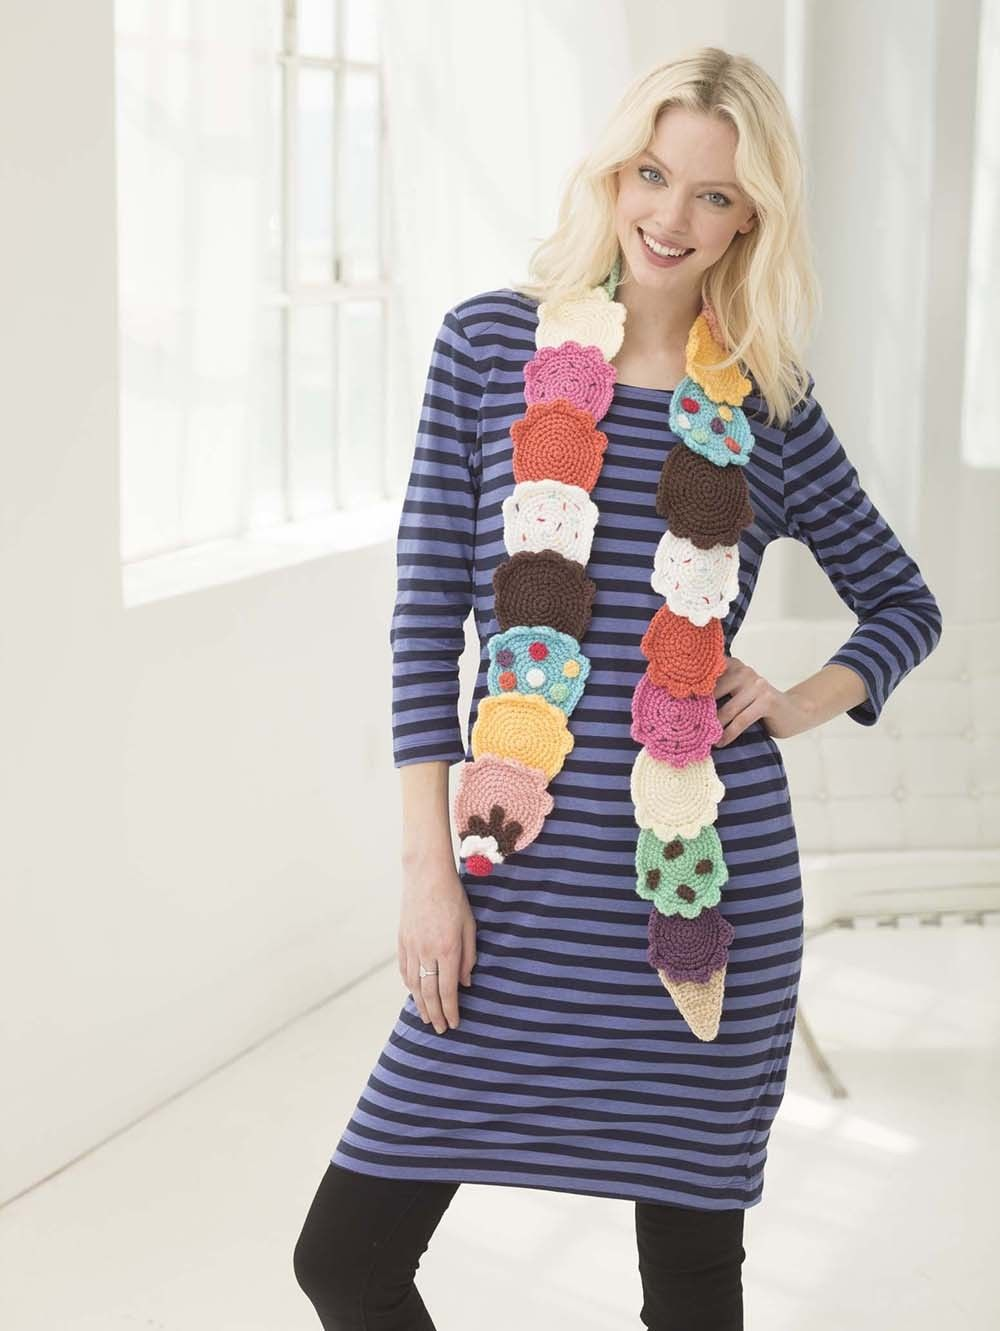 Ice Cream Scarf (Crochet)   Crochet Scraves and Cowls   Pinterest